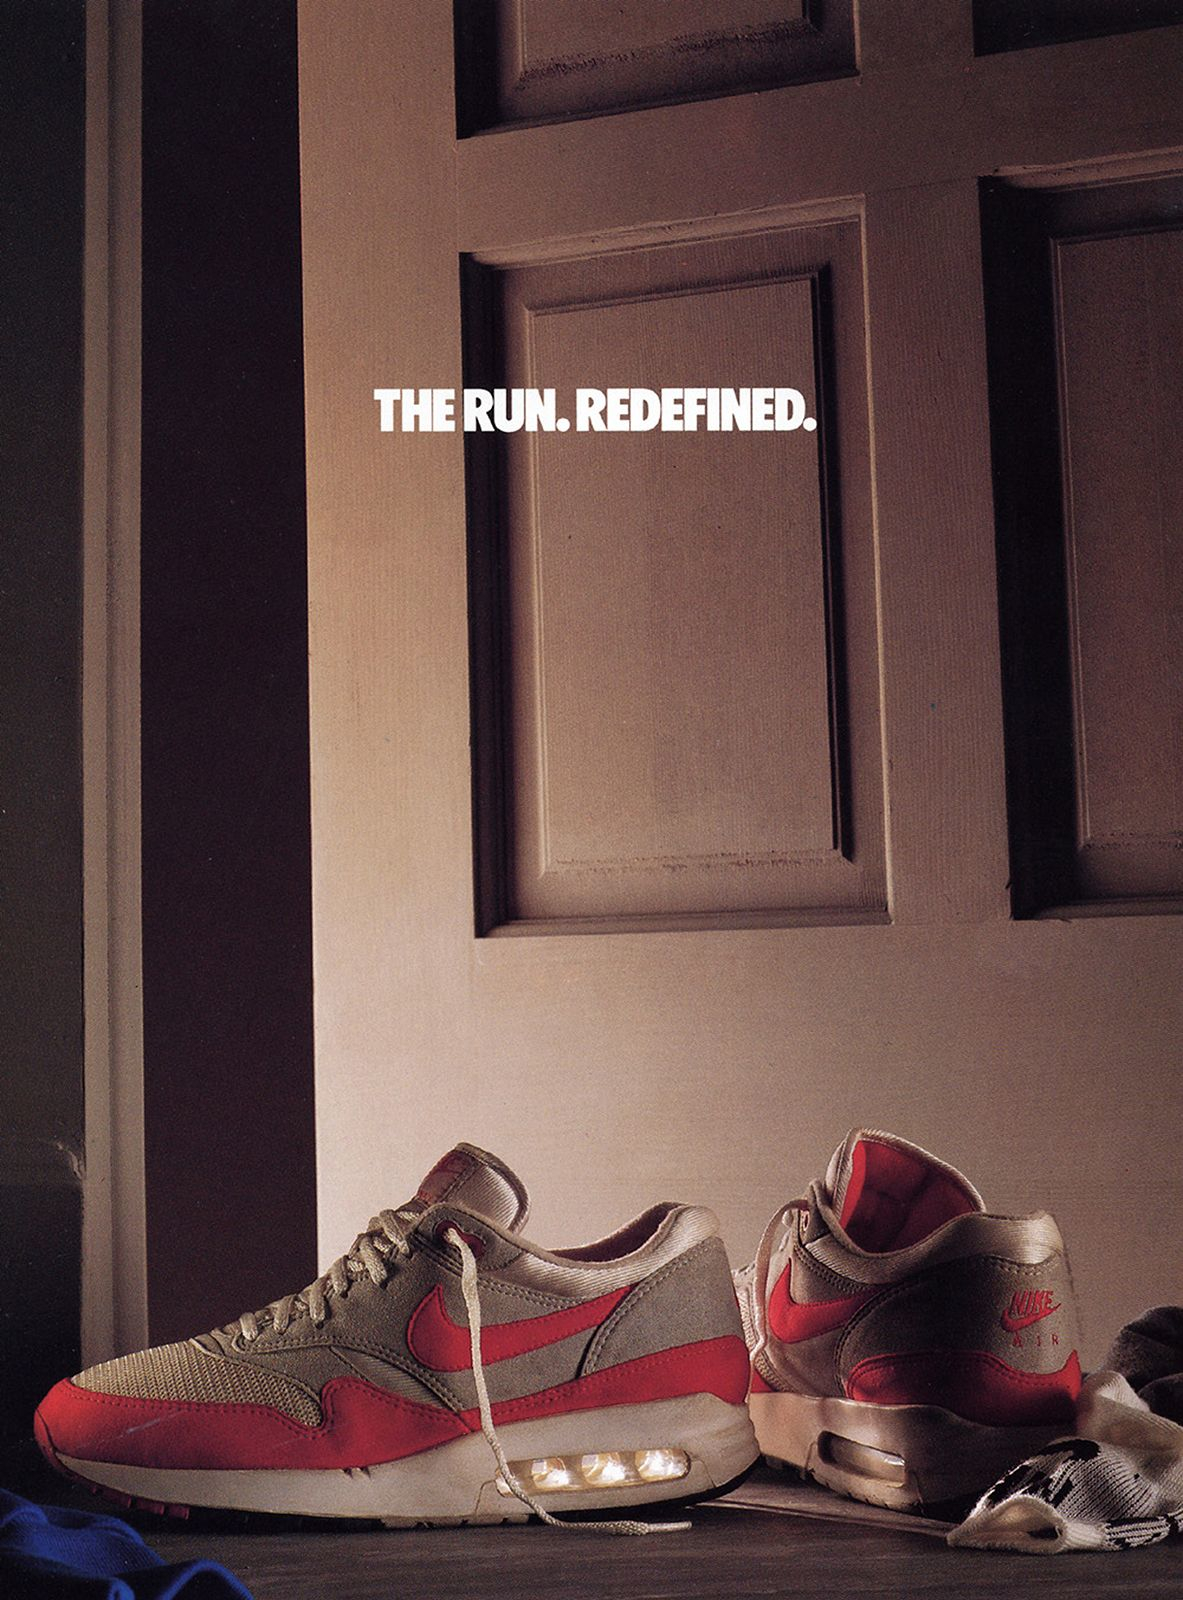 Nike Air Max 1 - The Run Redefined